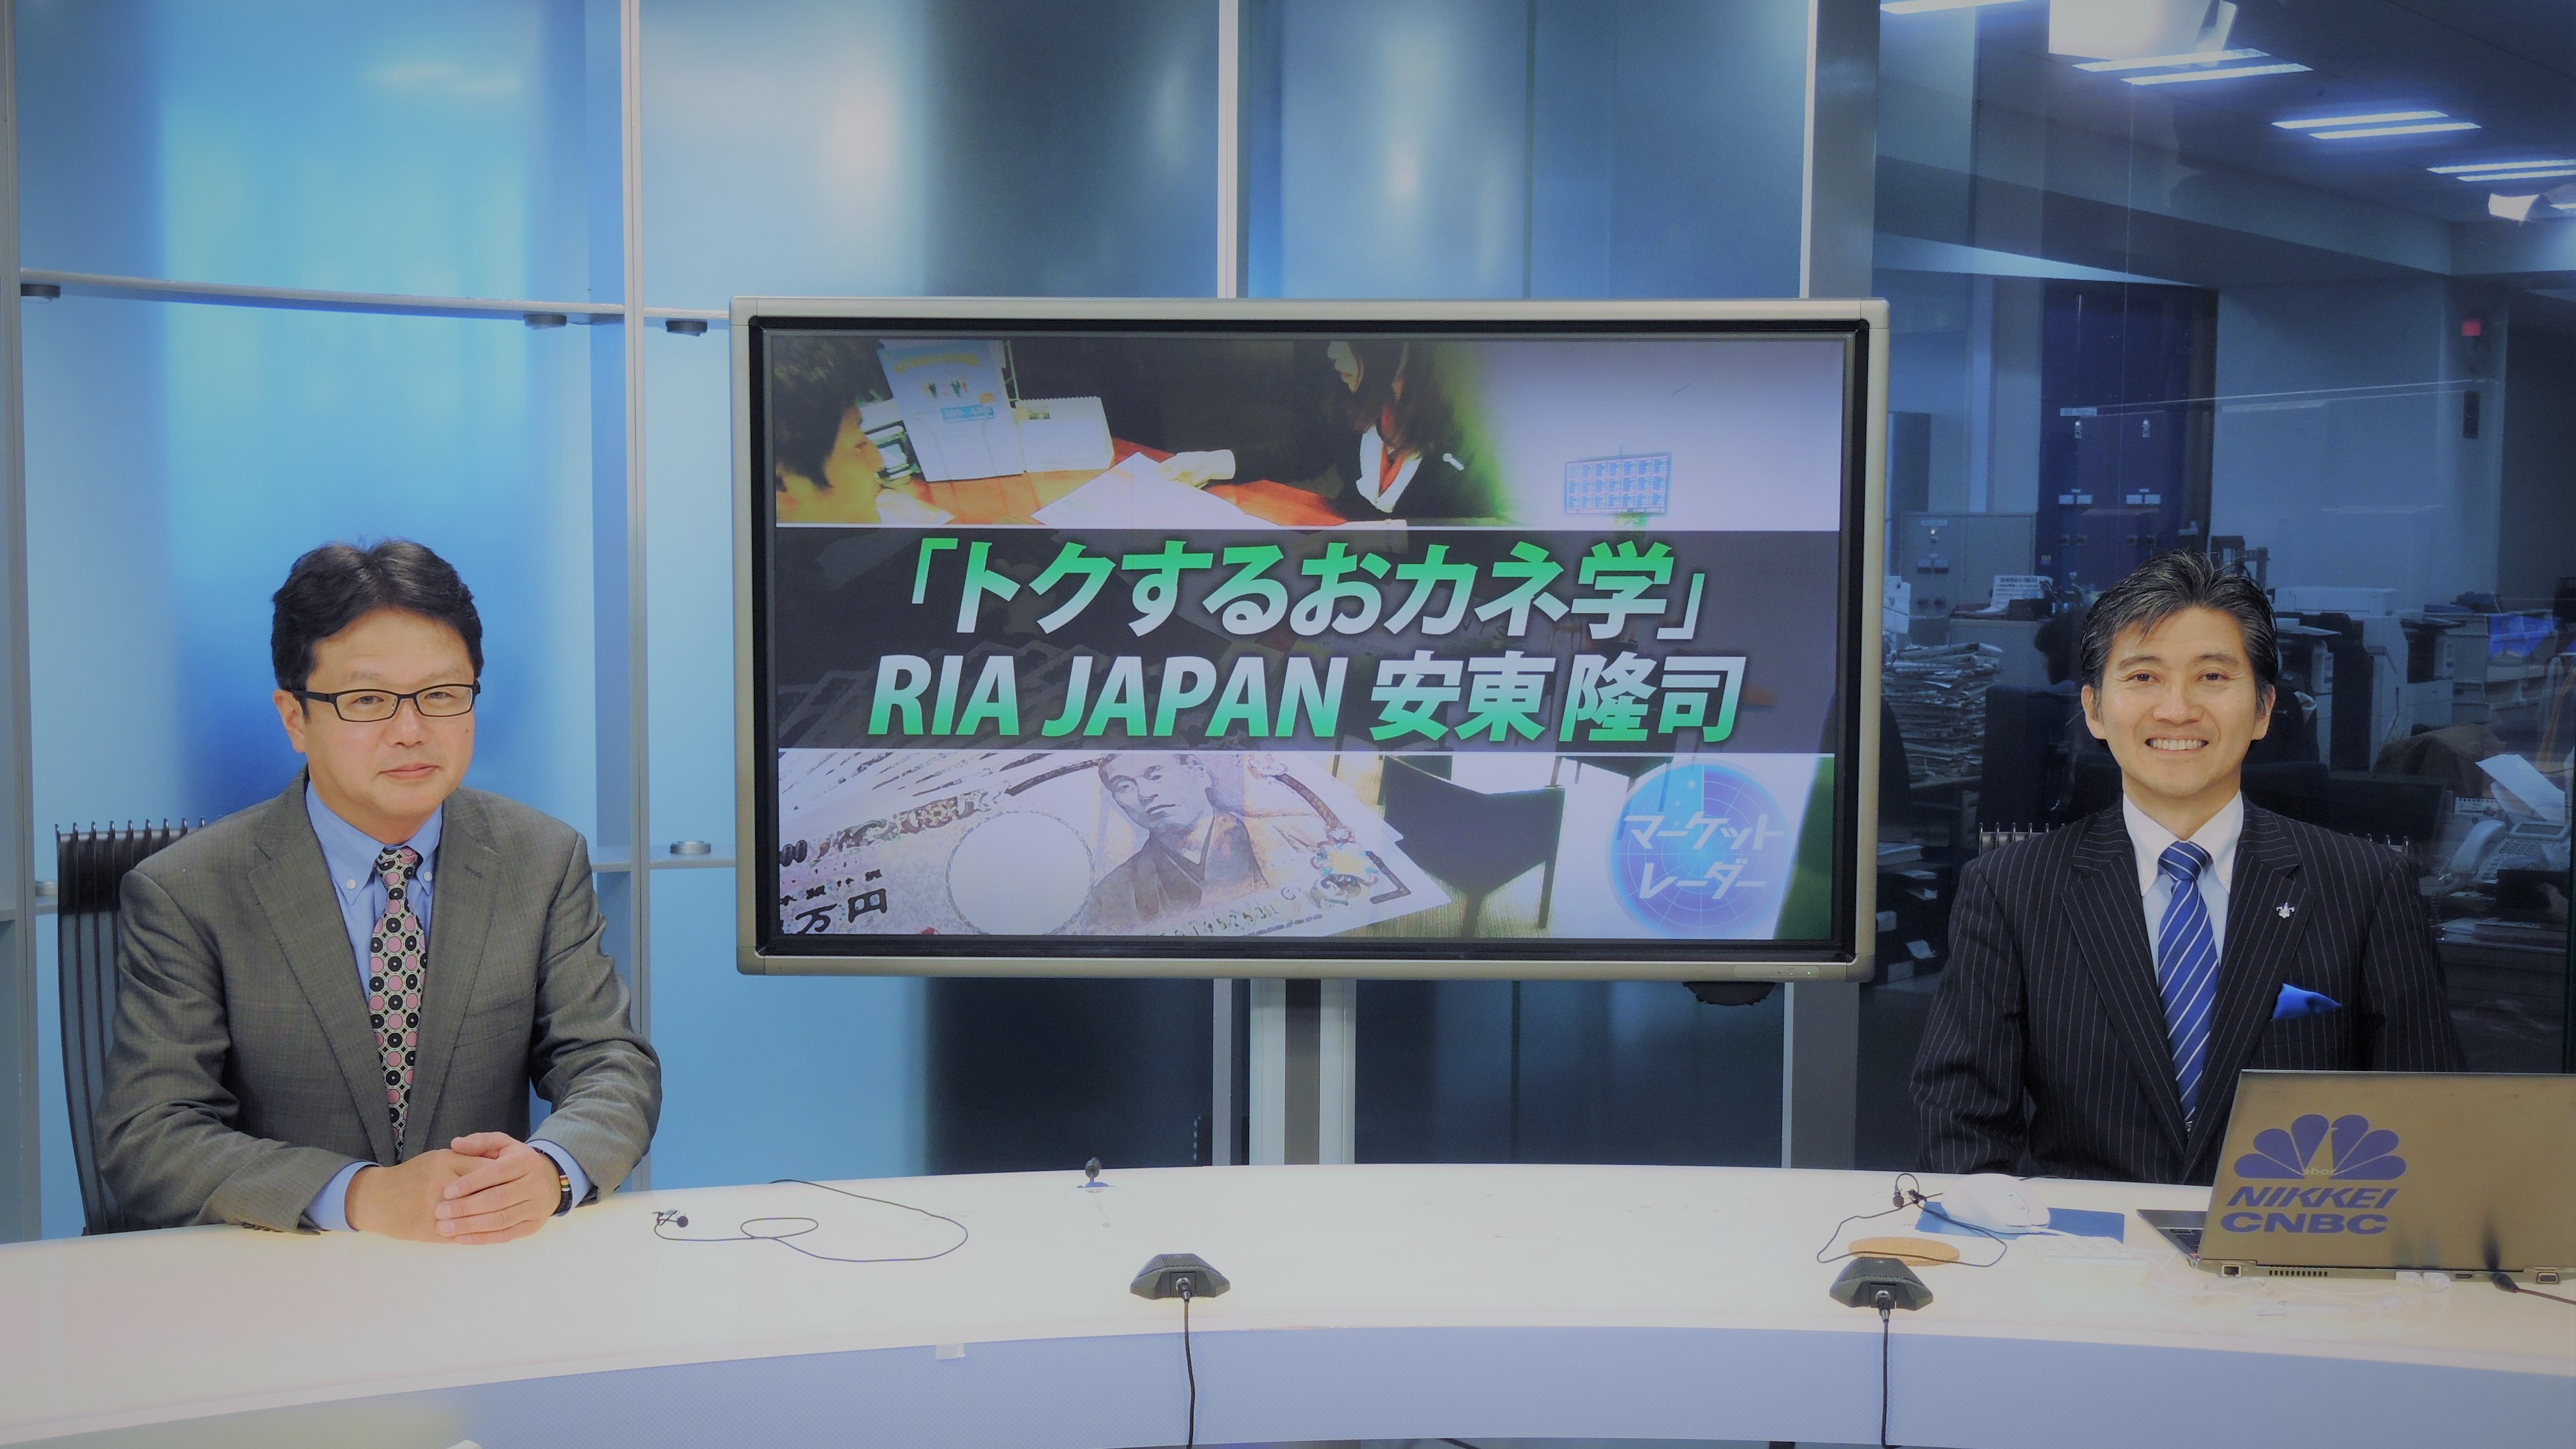 RIA JAPANメディア出演ページ